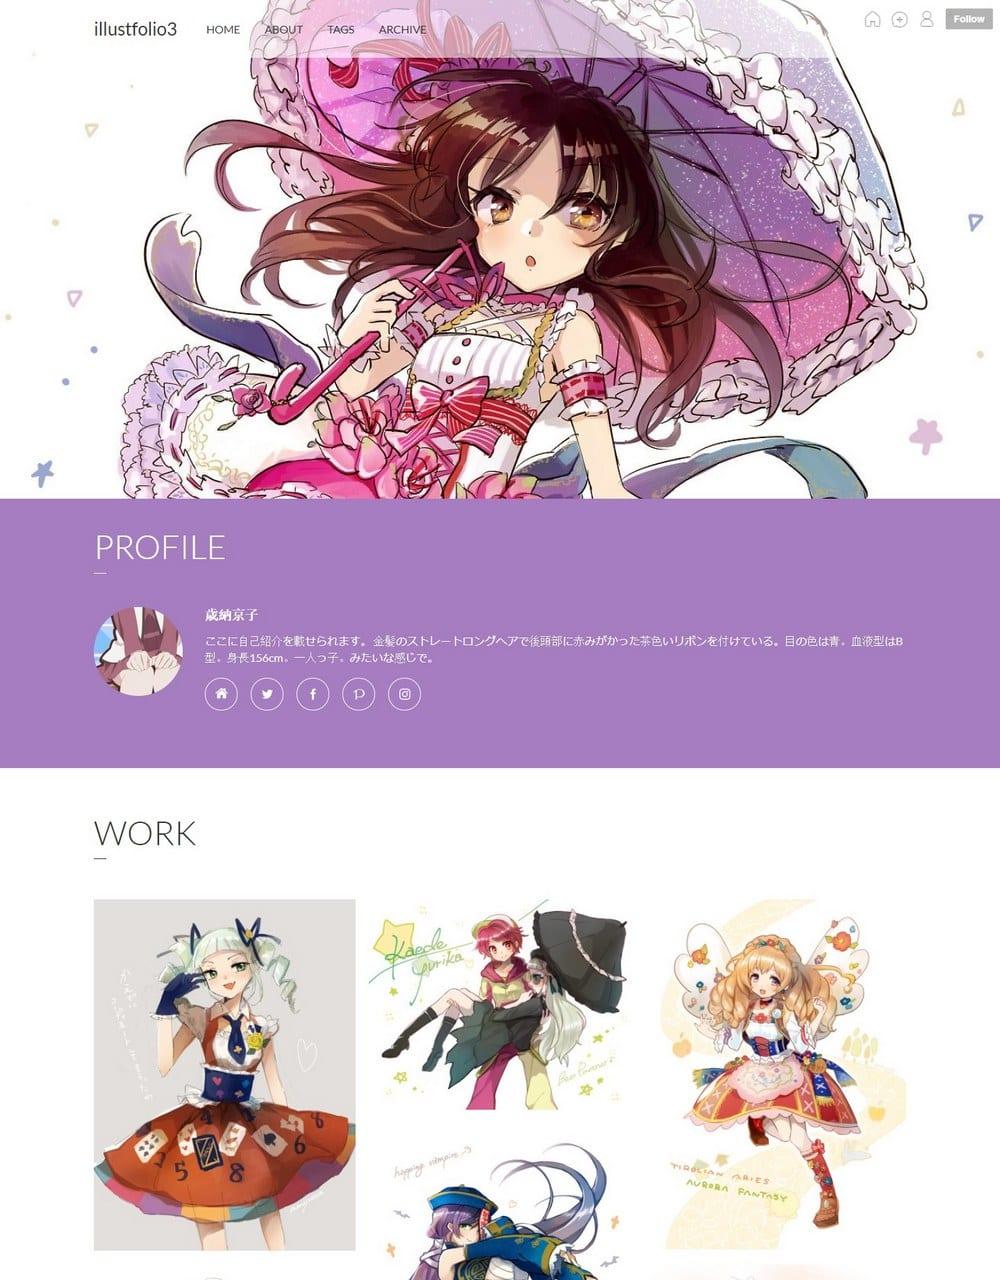 illustfolio3-cute-tumblr-theme